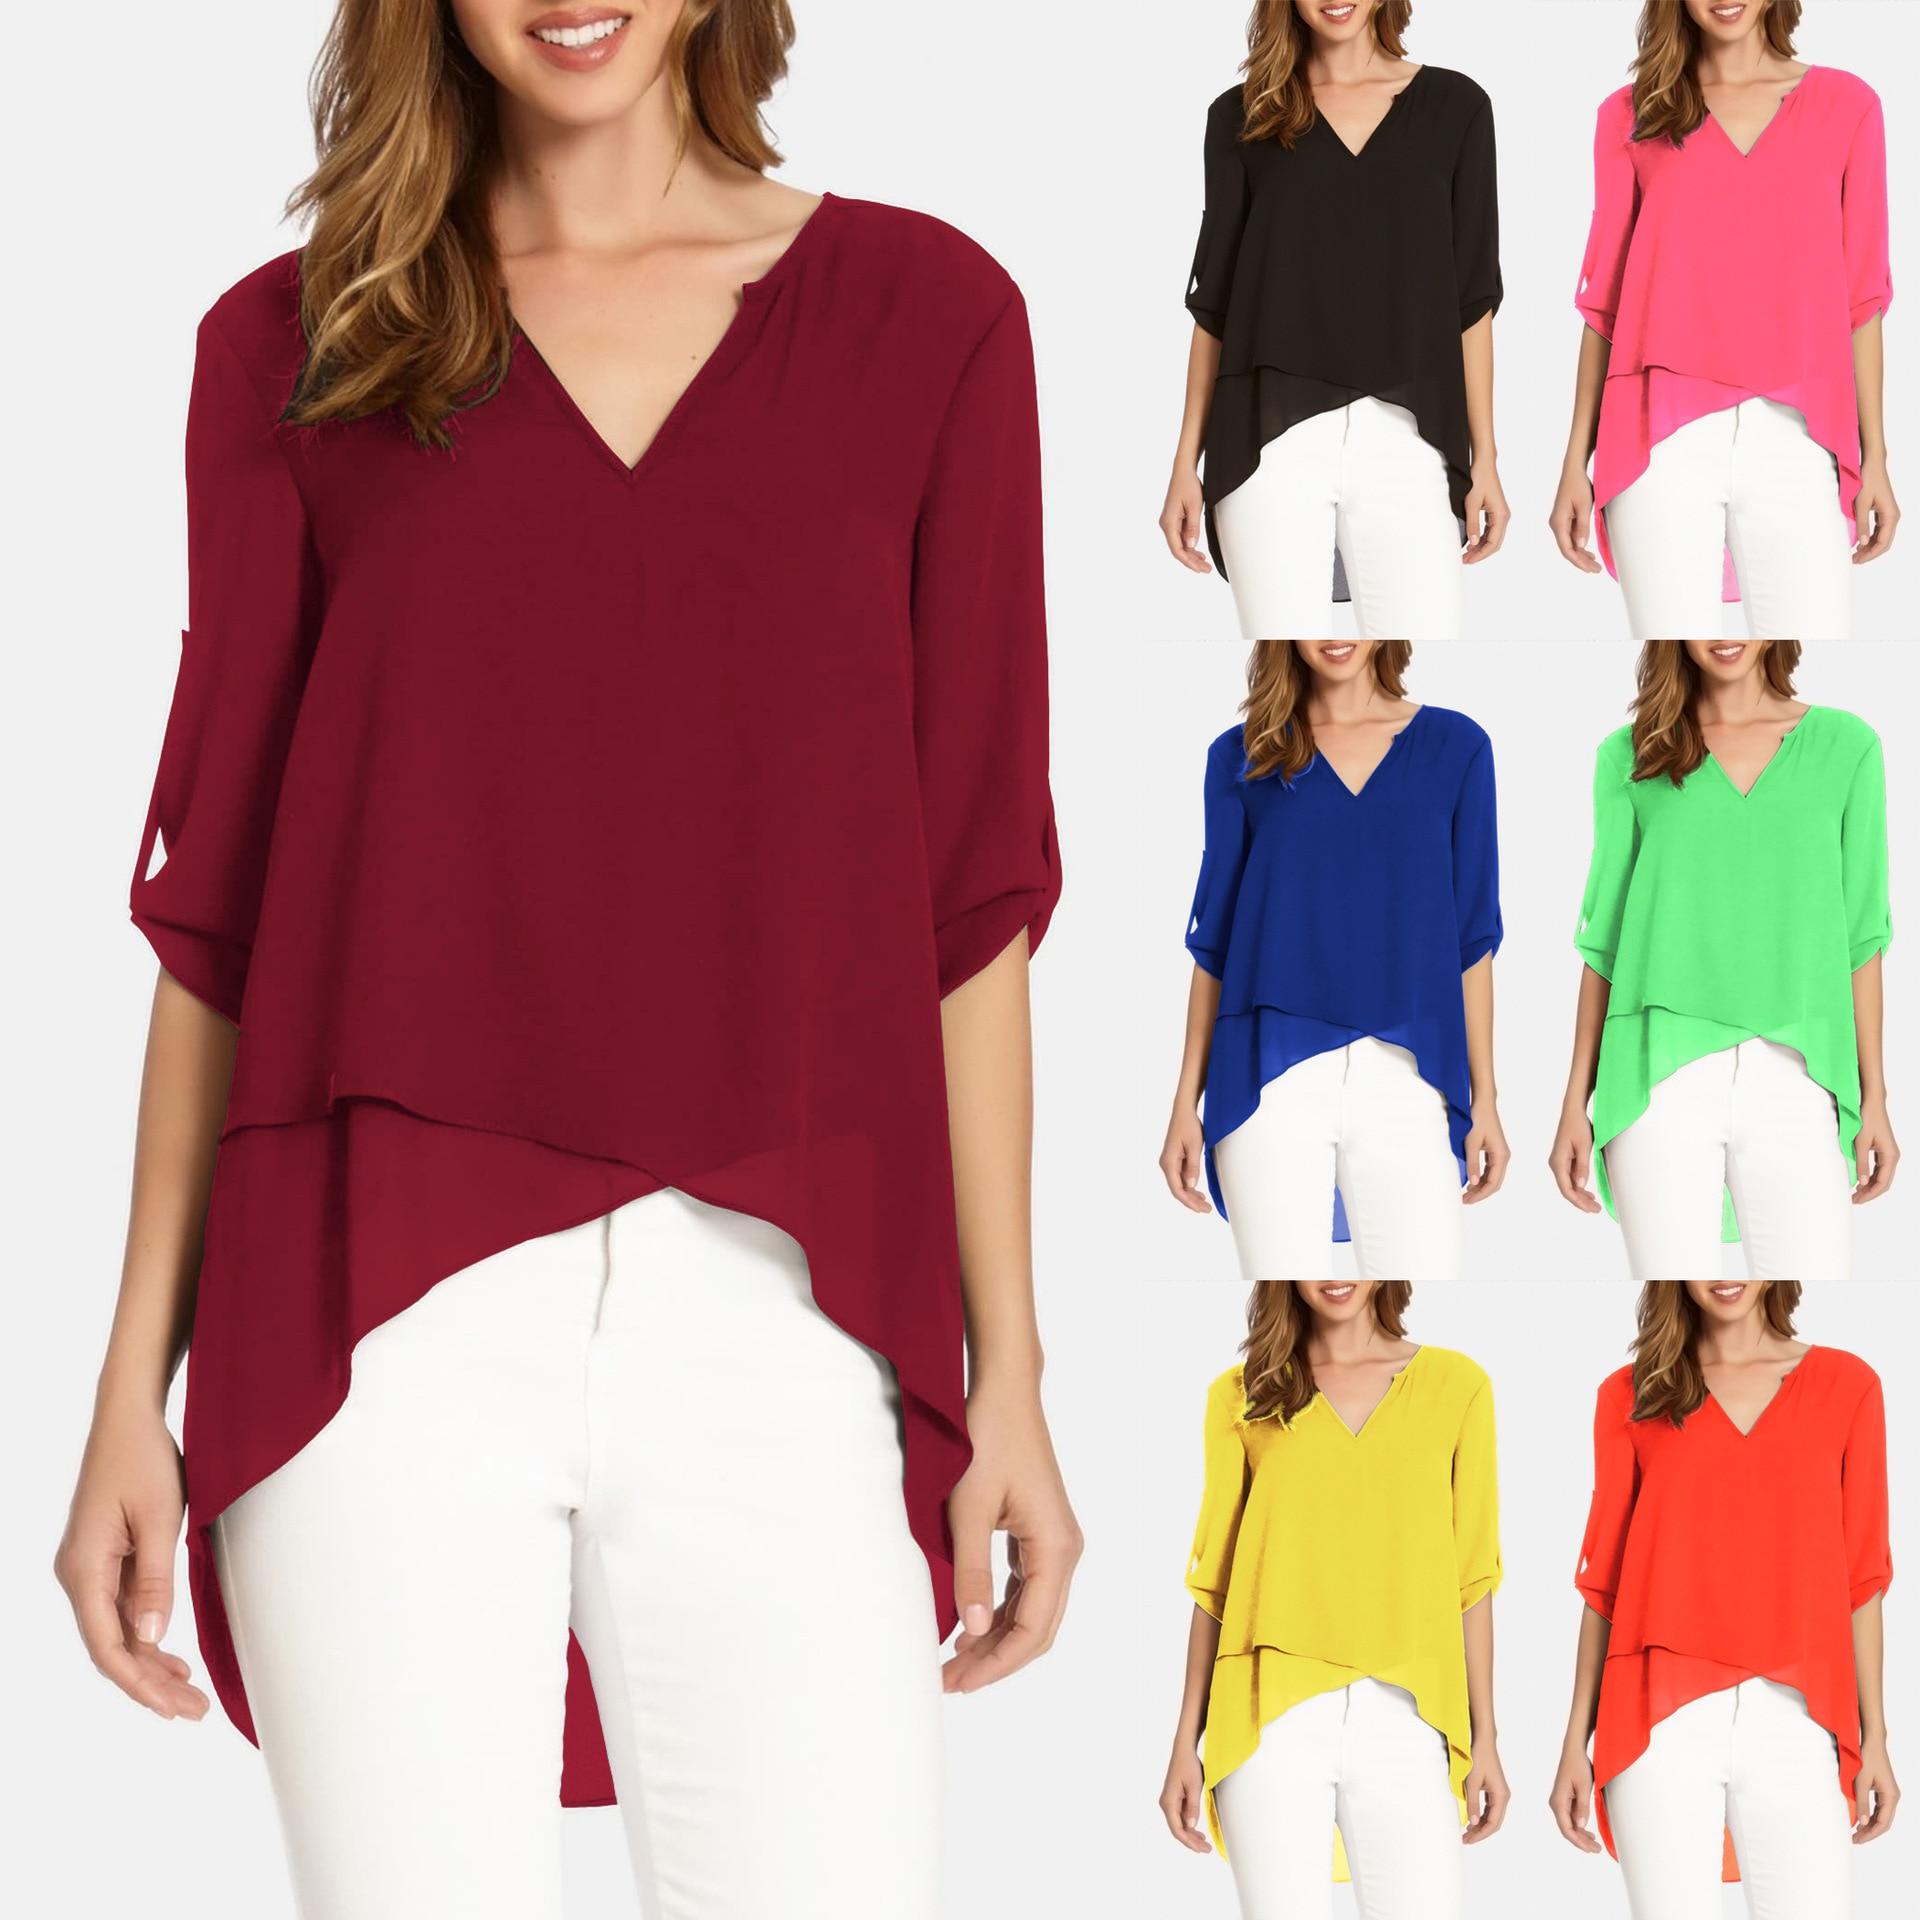 Blusa mujer 2020 estilo caliente cuello pico Color sólido brazaletes Irregular suelto camisa Dropshipping Vestidos YFF6275